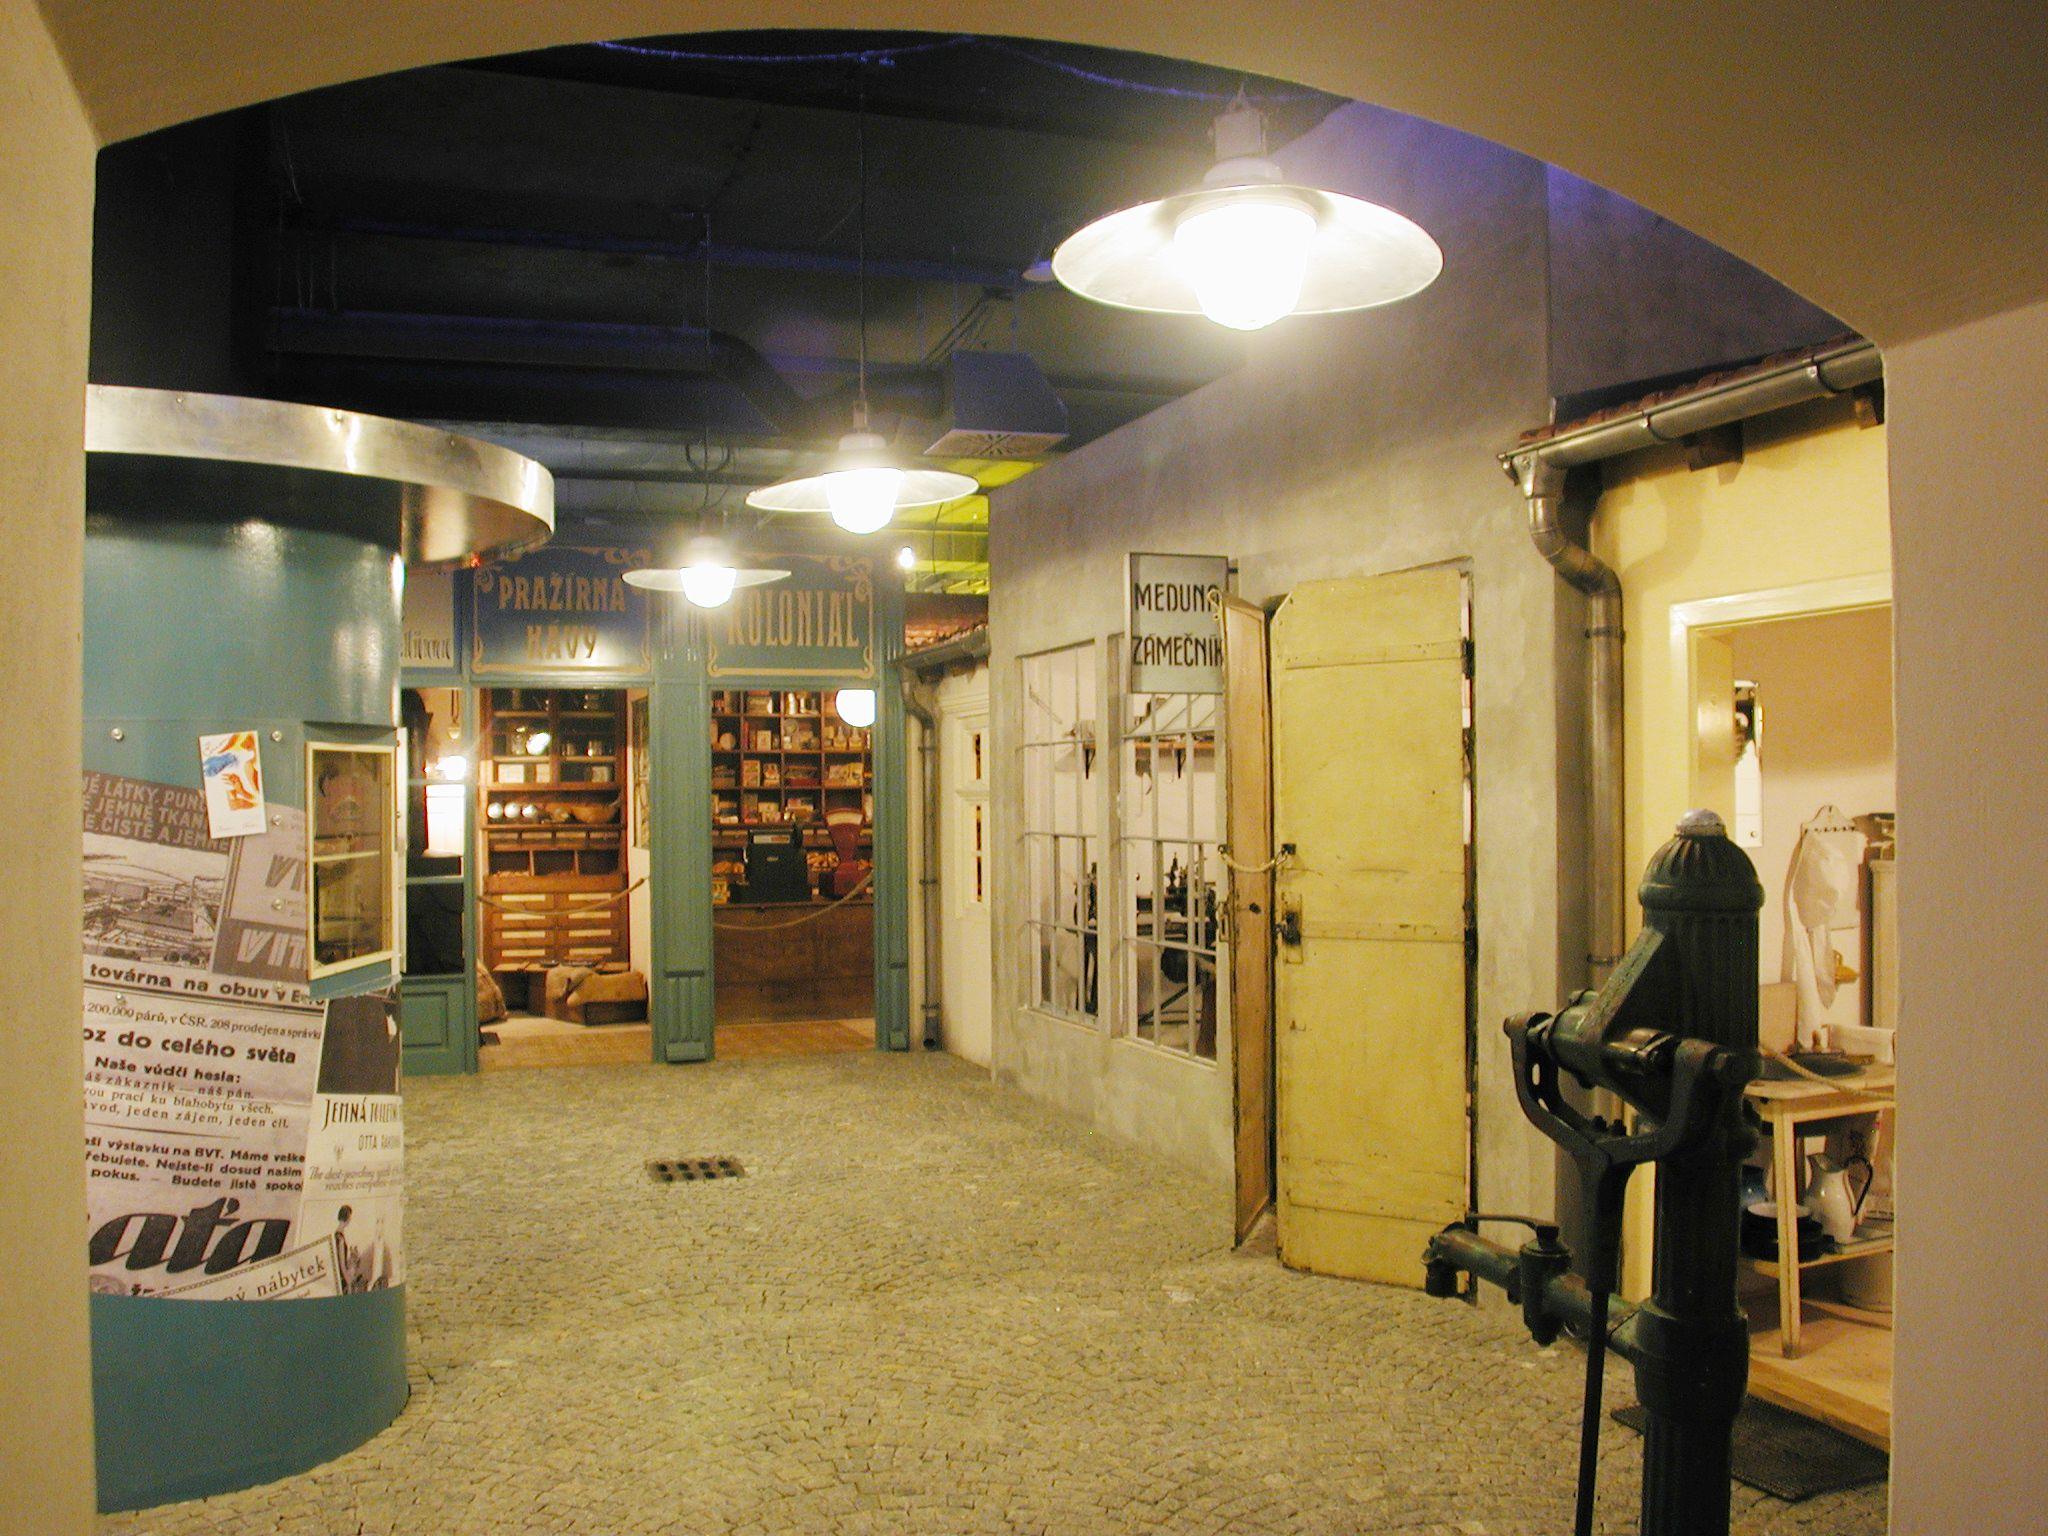 Technical Museum in Brno (Technické muzeum v Brně)